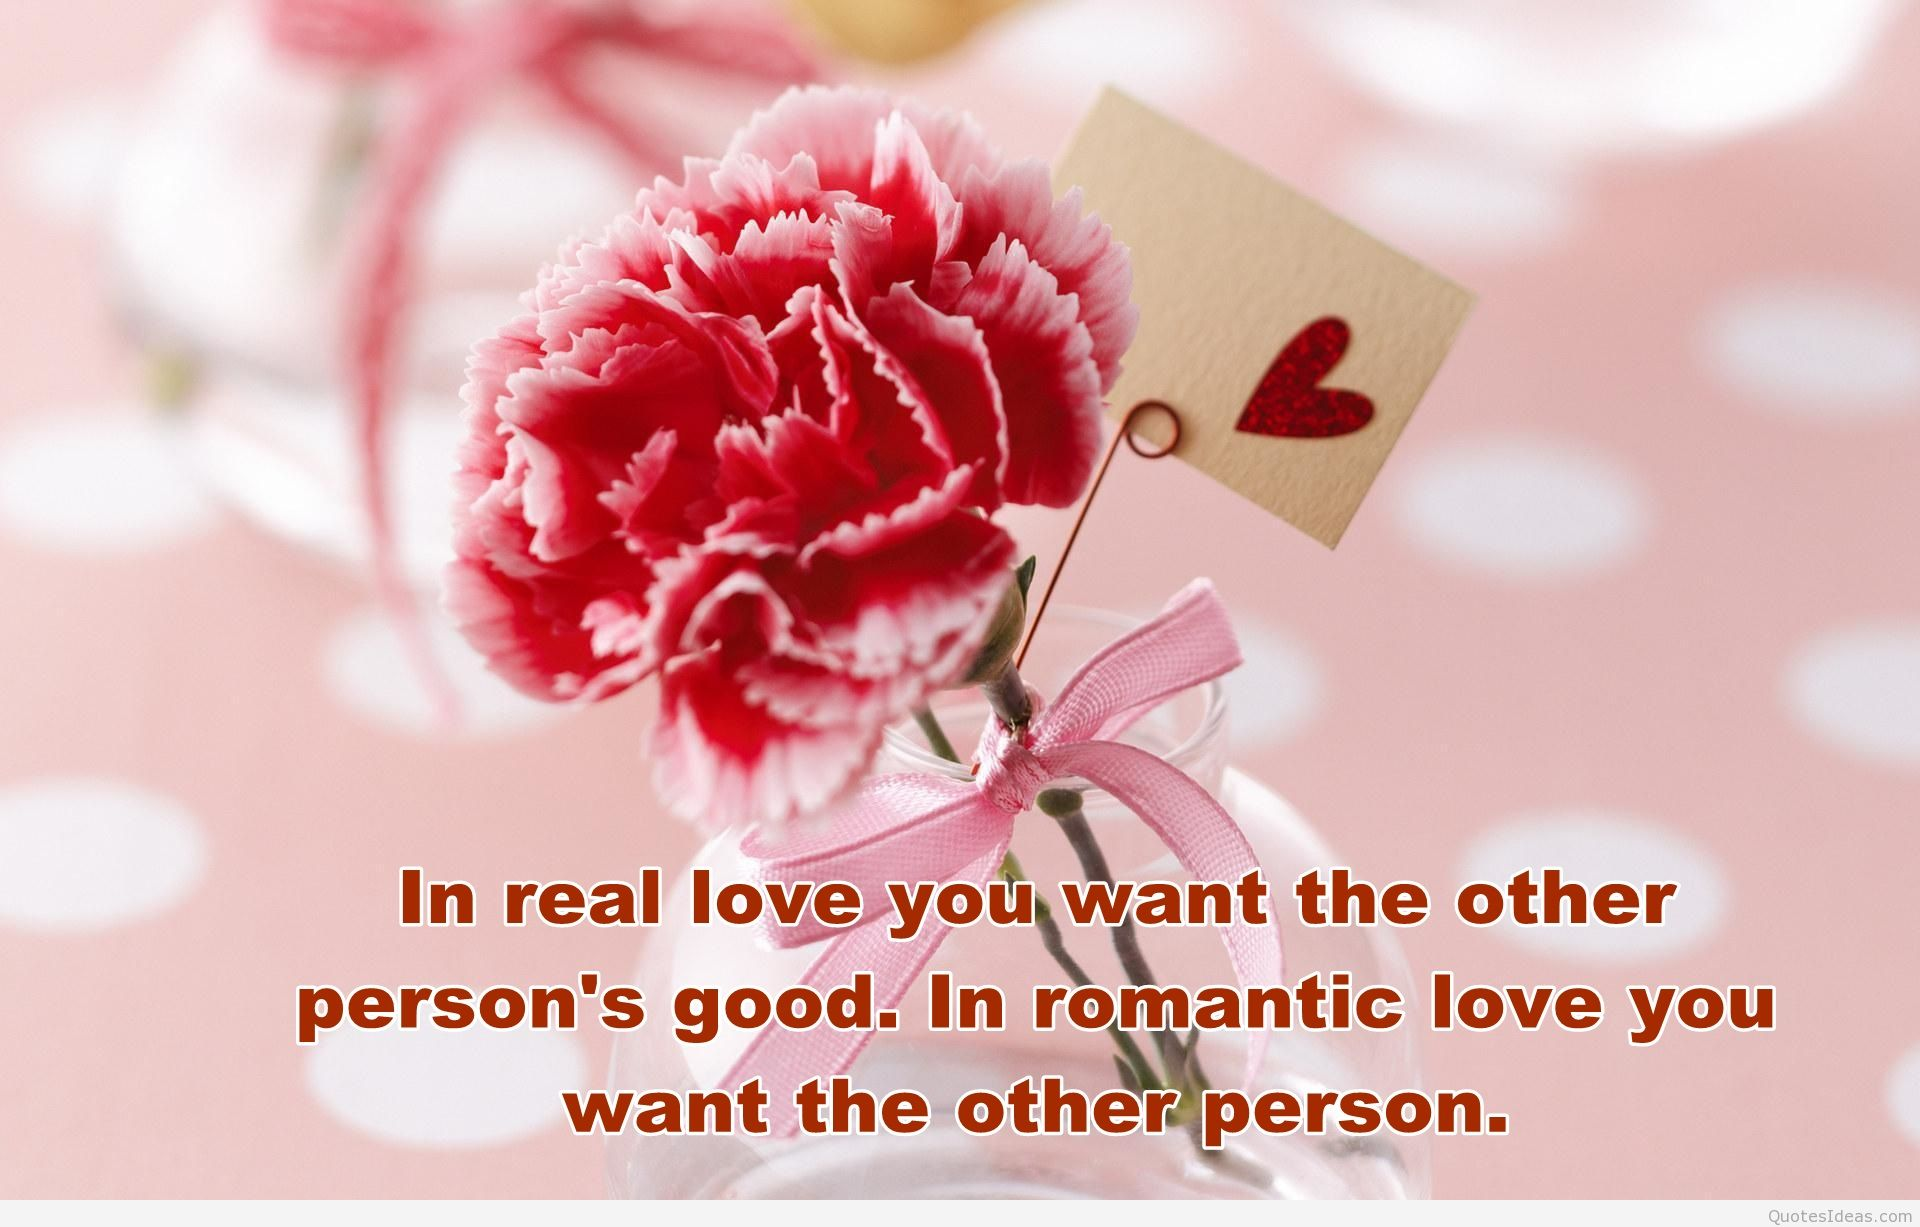 Romantic Rose Romantic Quote - Love Romantic Wallpaper With Quotes - HD Wallpaper